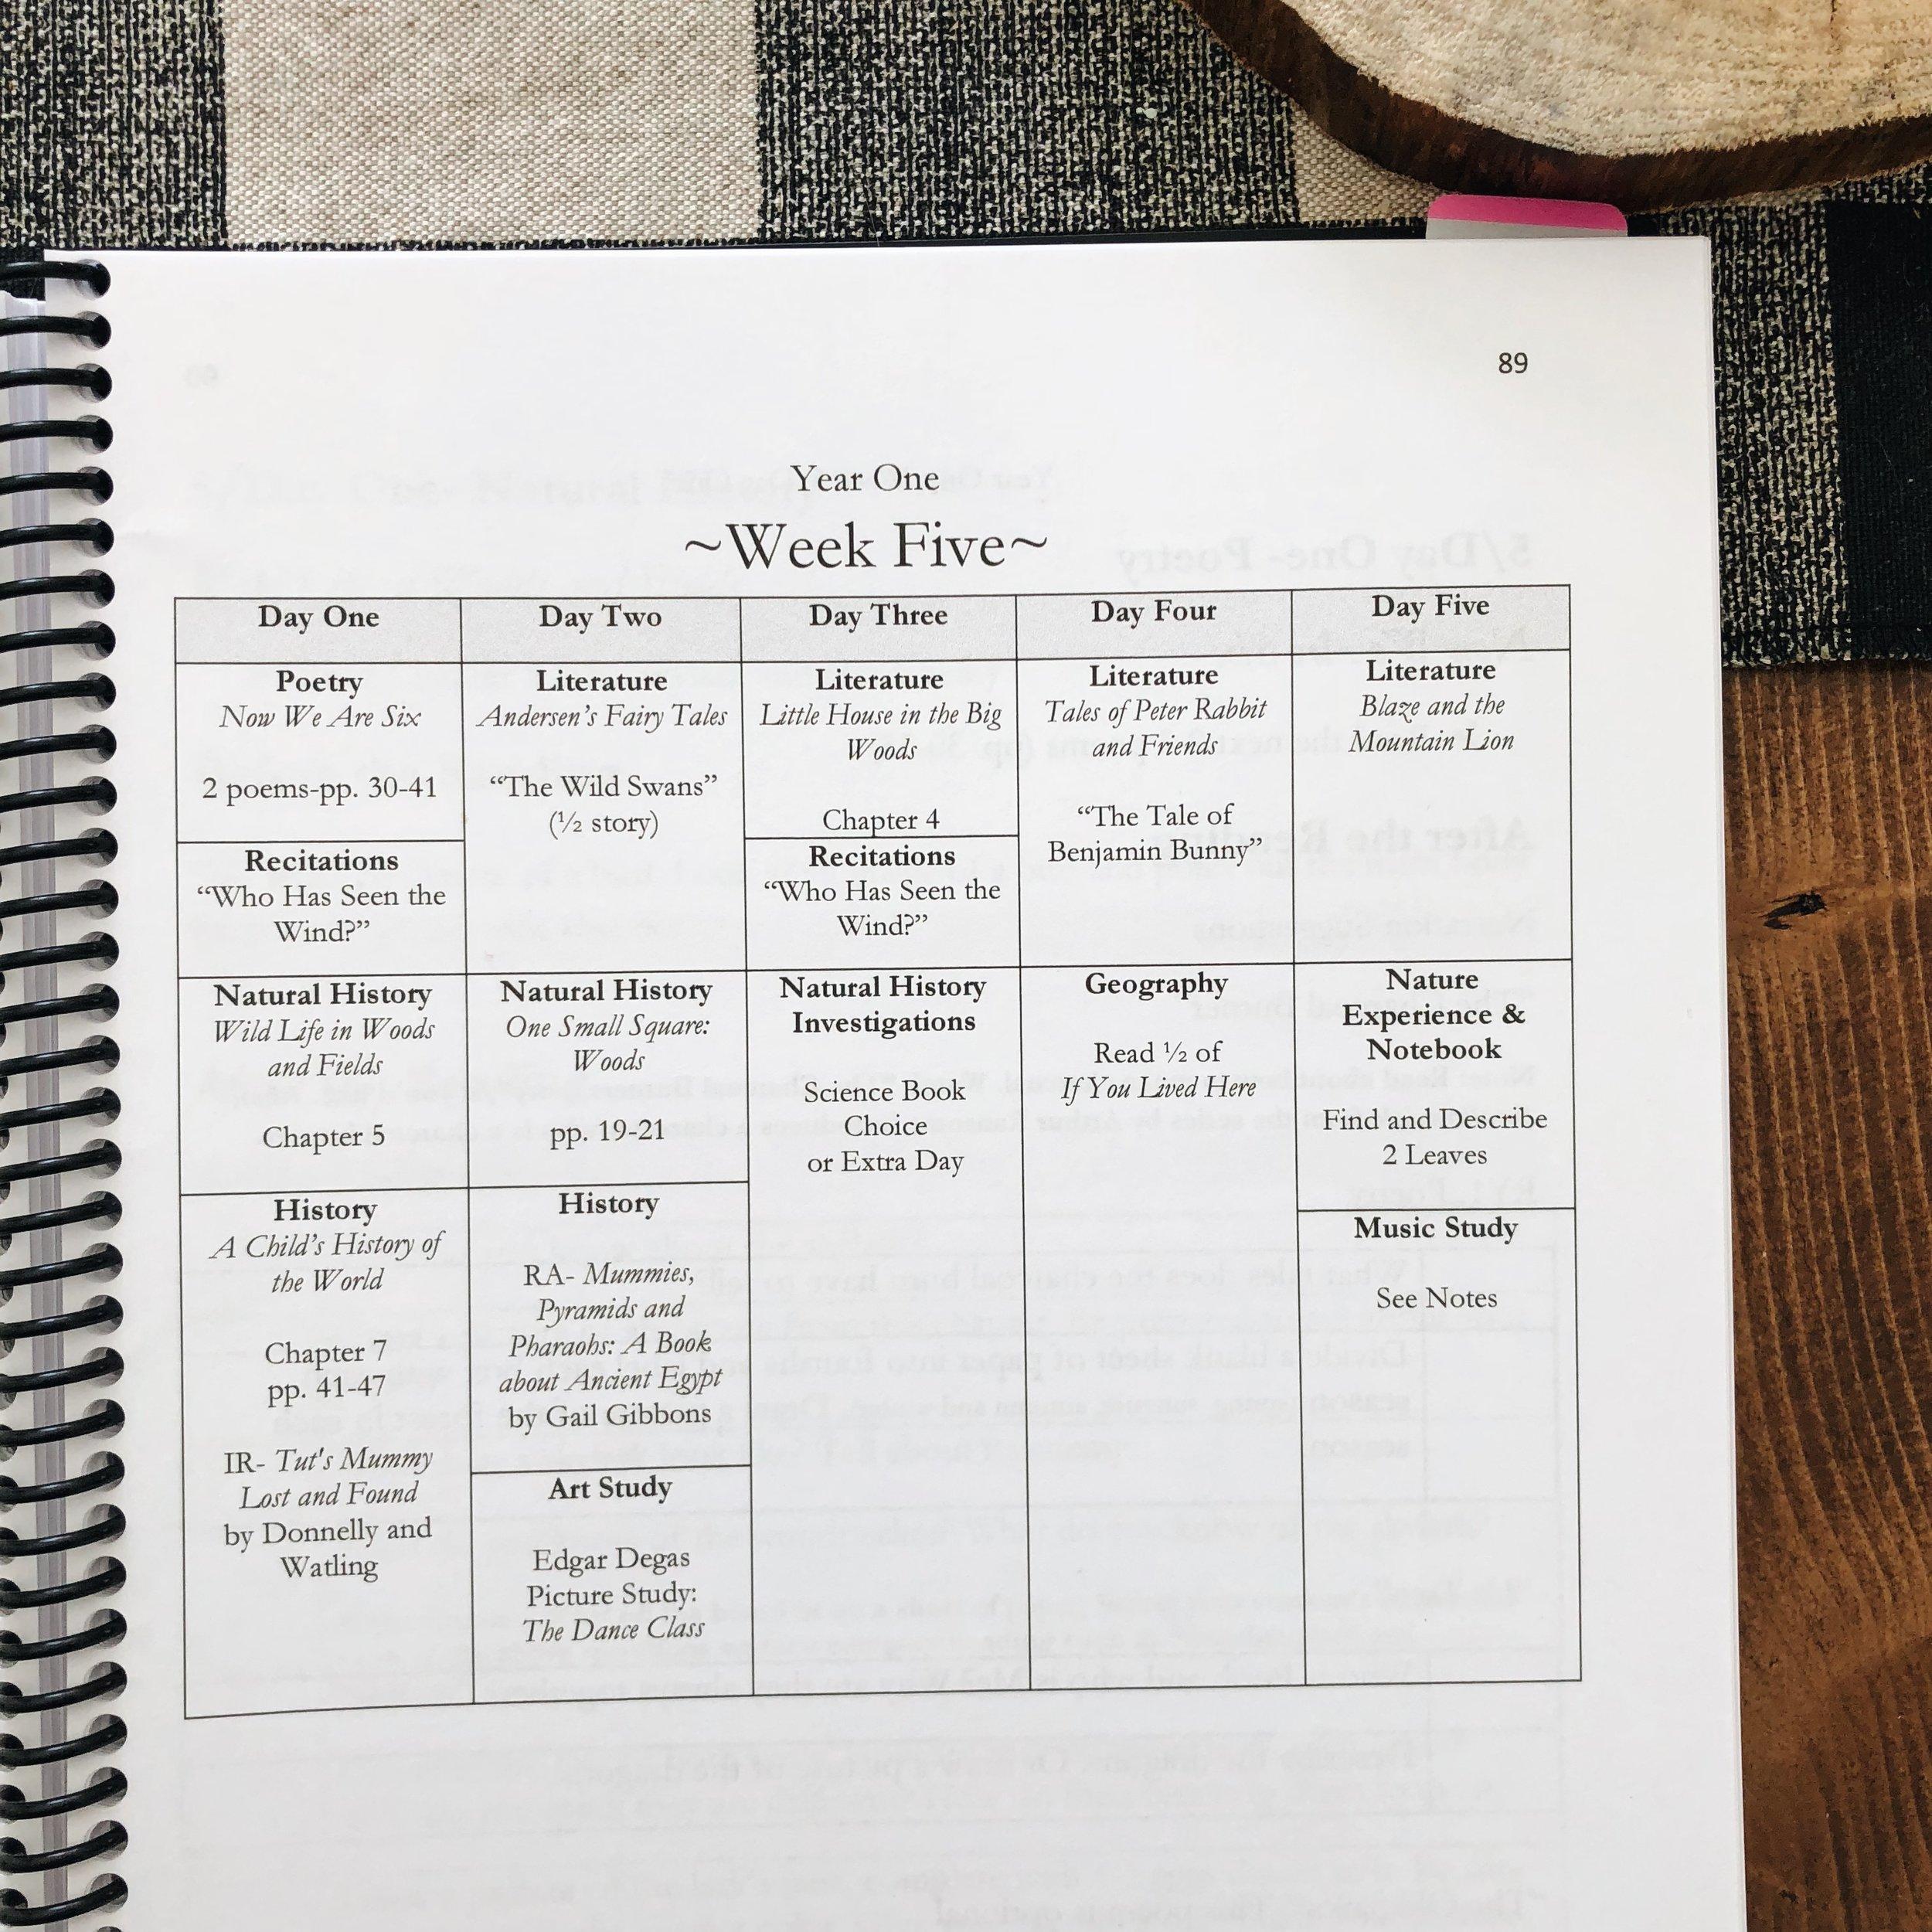 A Week of First Grade Lessons in a Charlotte Mason Homeschool | on theschoolnest.com | #homeschool #charlottemason